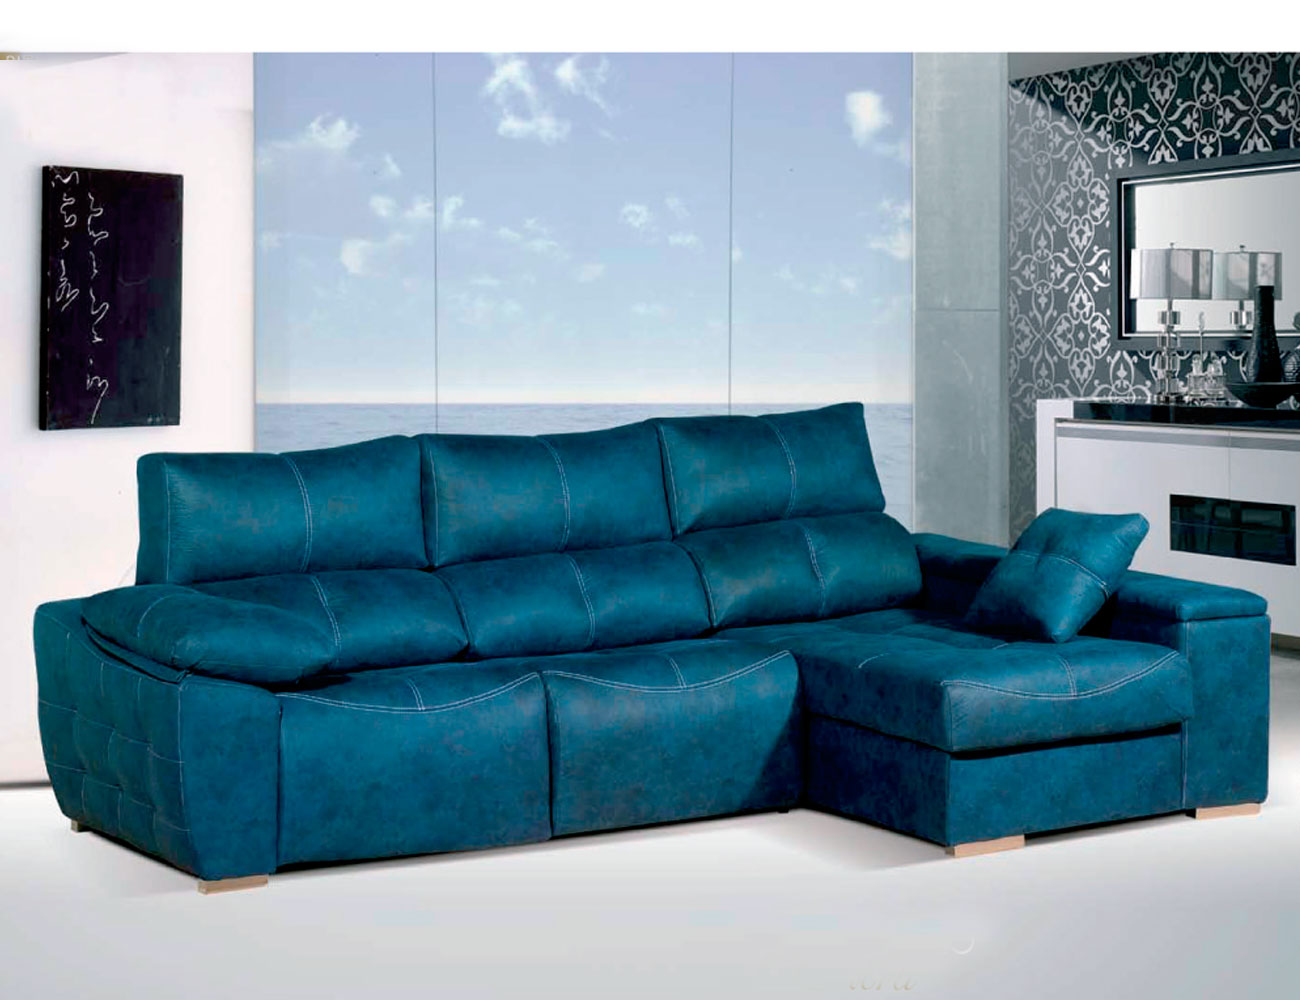 Sofa chaiselongue relax 2 motores anti manchas turquesa45